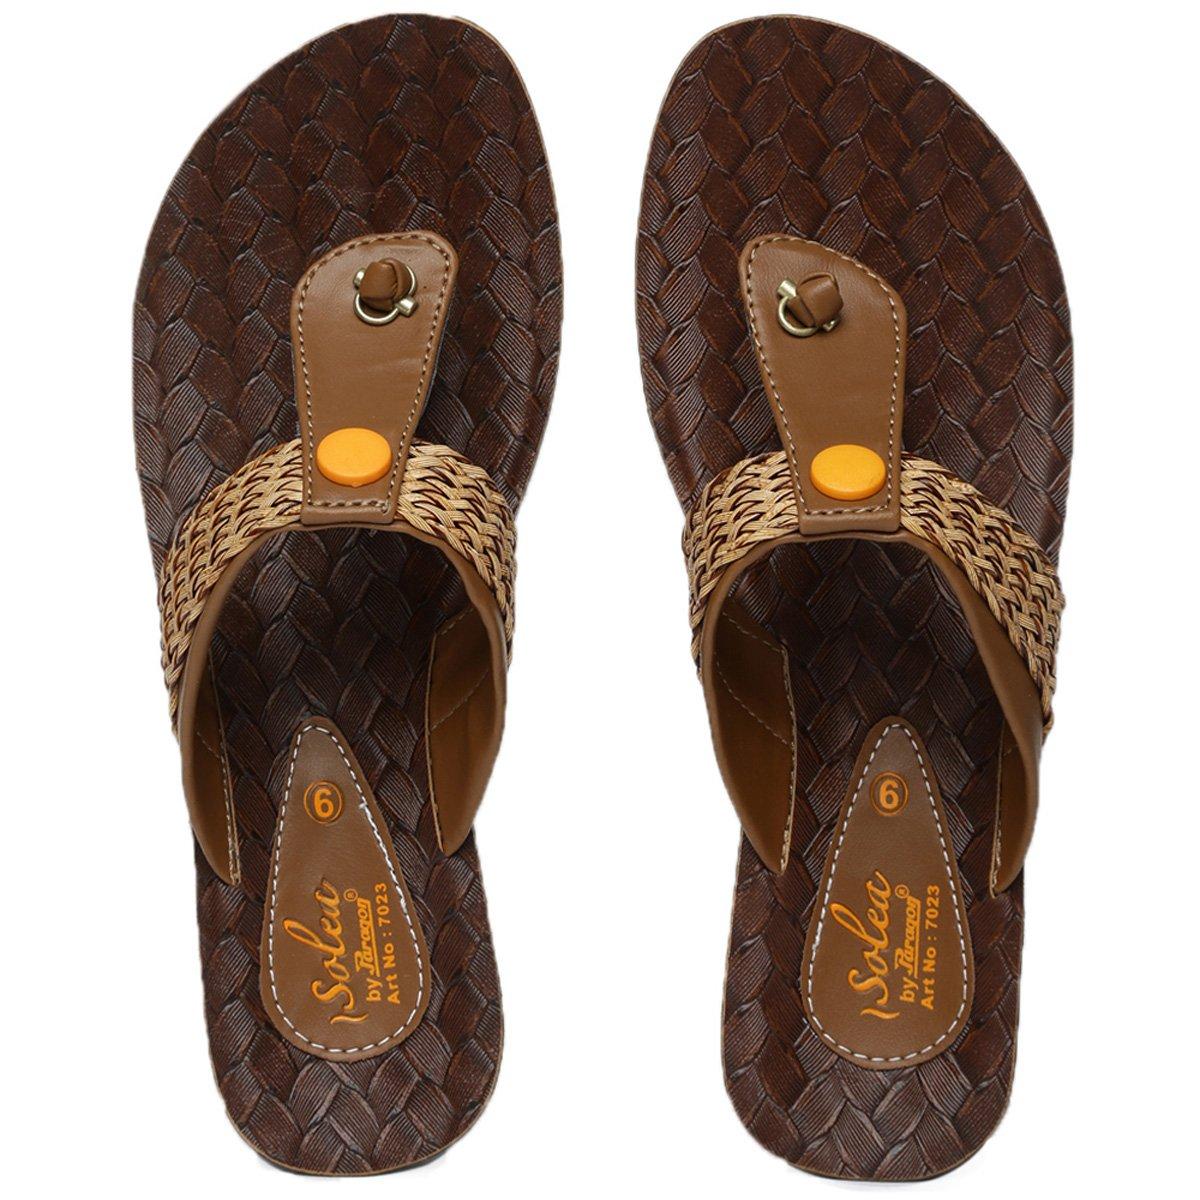 5f30850fdb0cb PARAGON SOLEA Women s Brown Flip-Flops - Ratzz Collection